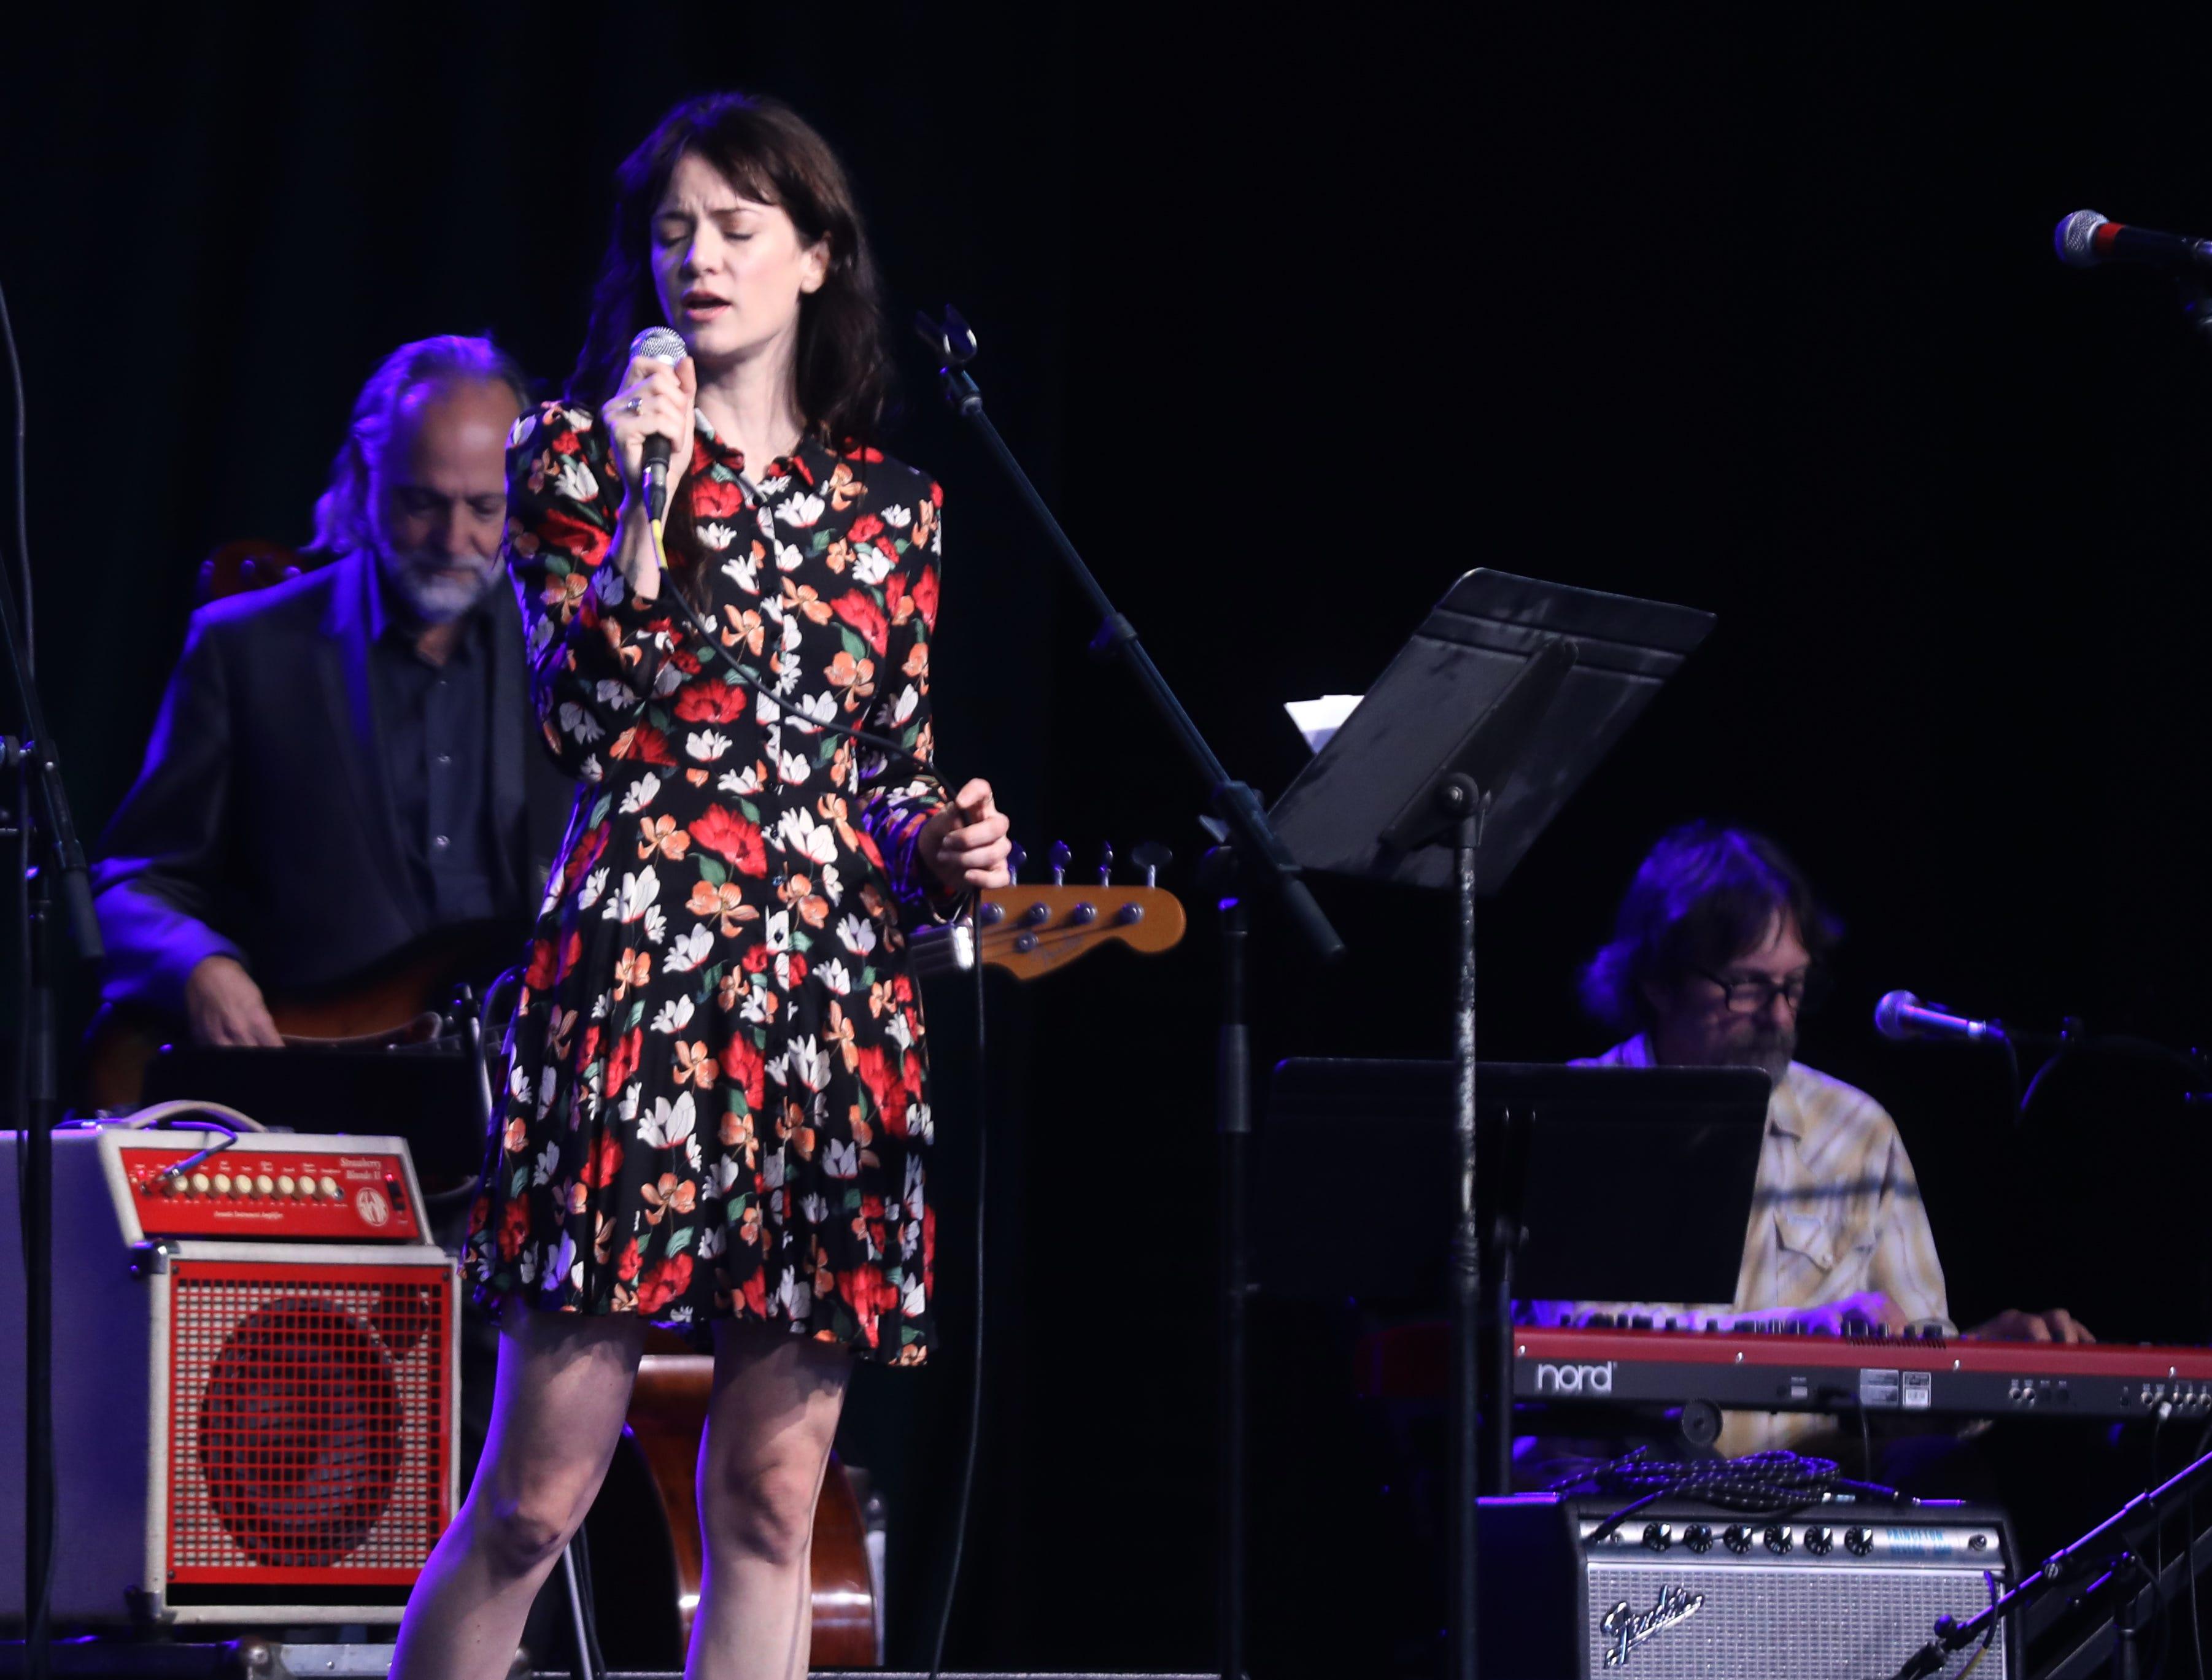 Nikki Lane performs during a Celebration of Life service held for singer-songwriter Tony Joe White at Marathon Music Works Wednesday, October 31, 2018.